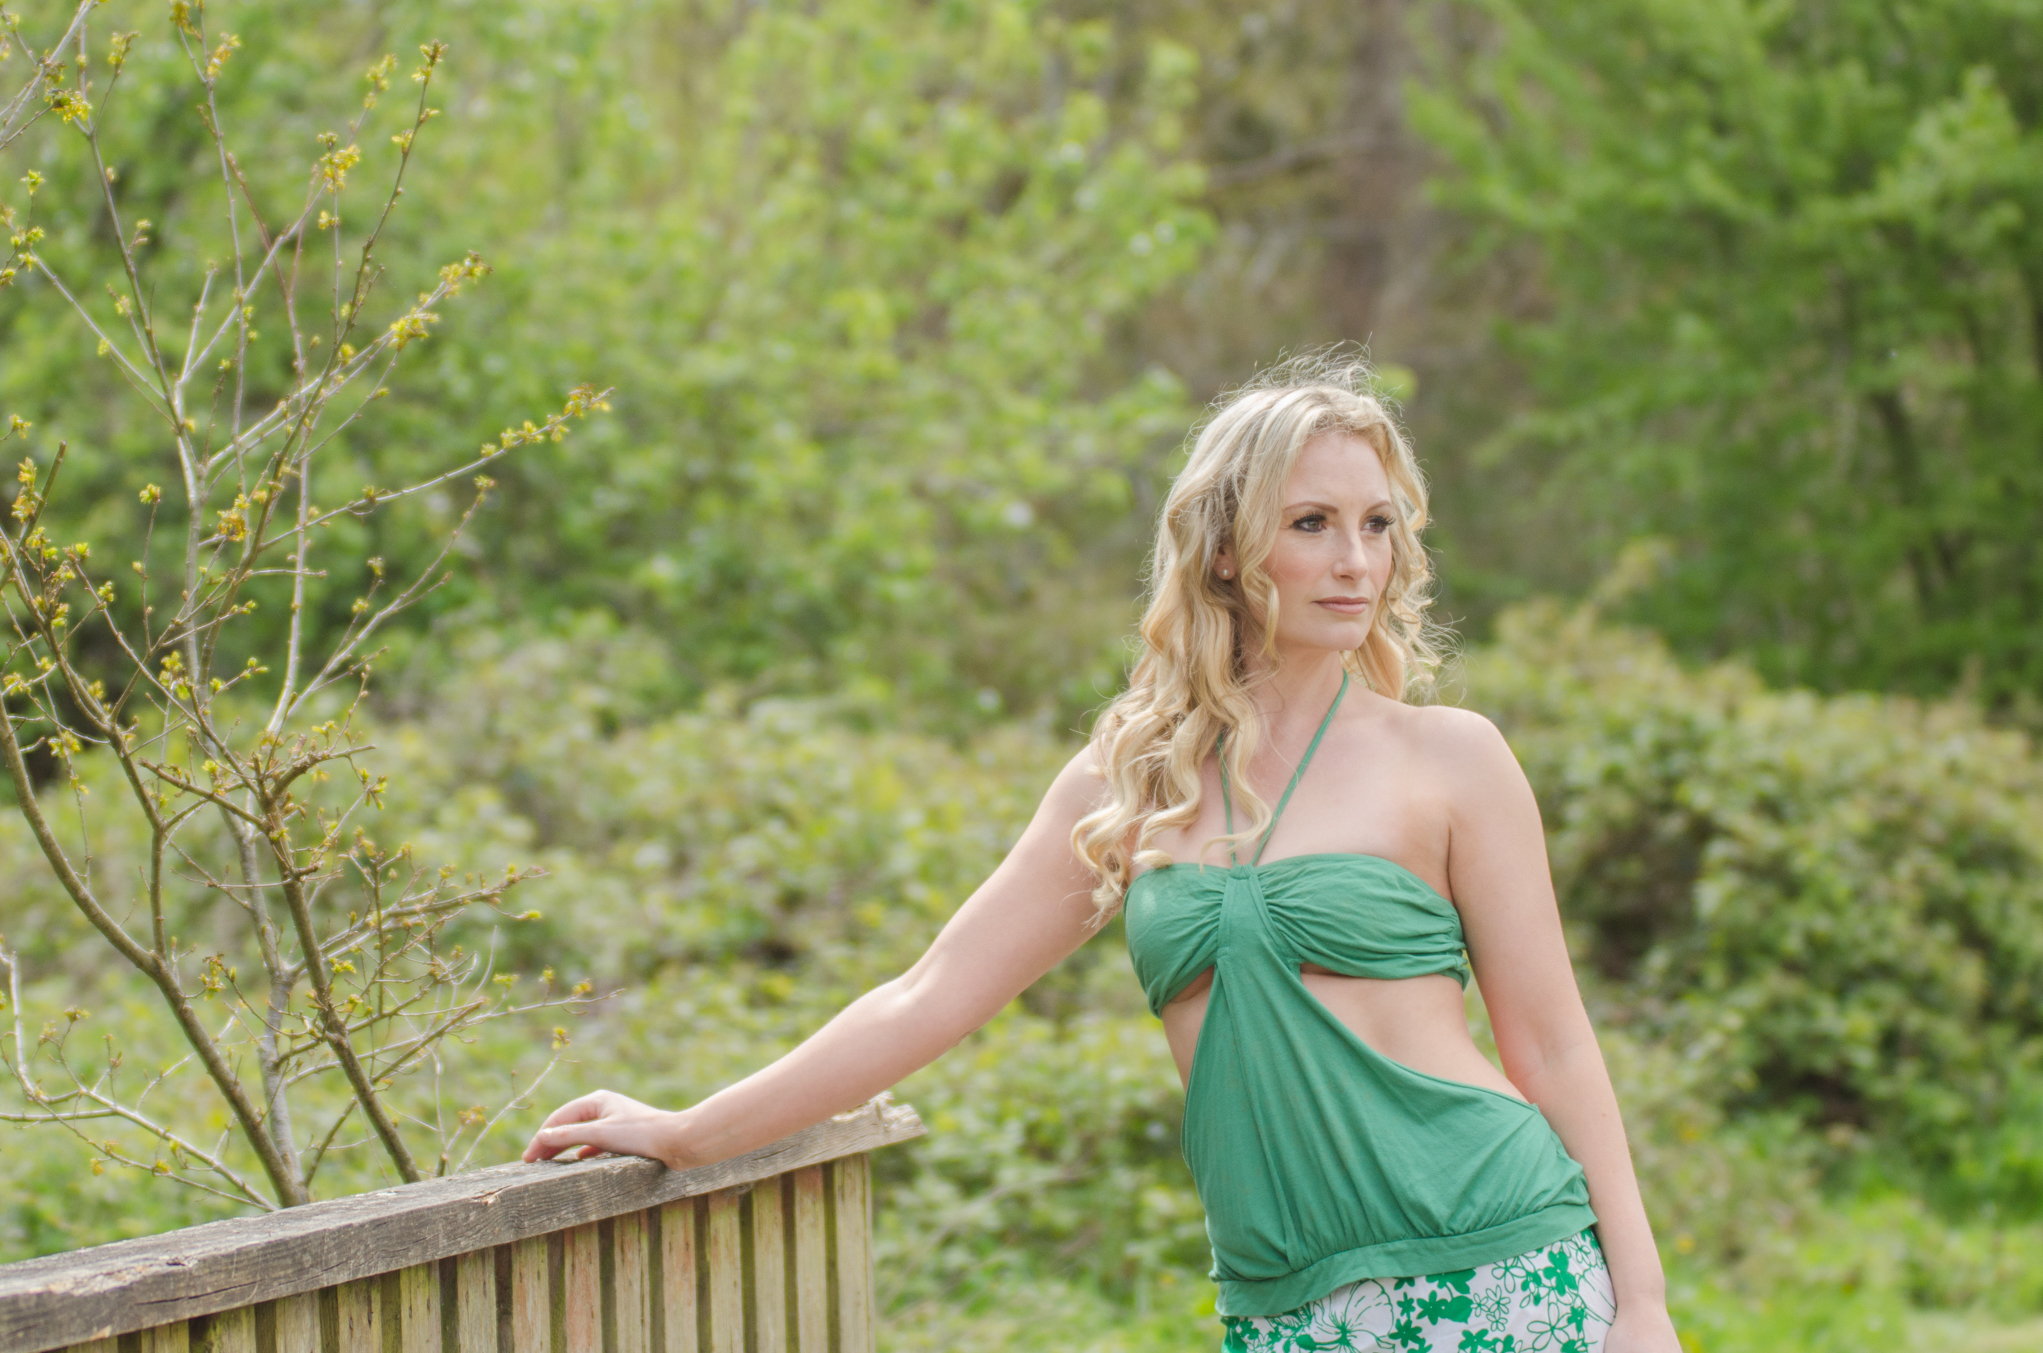 www.simonhawkins-photography.com